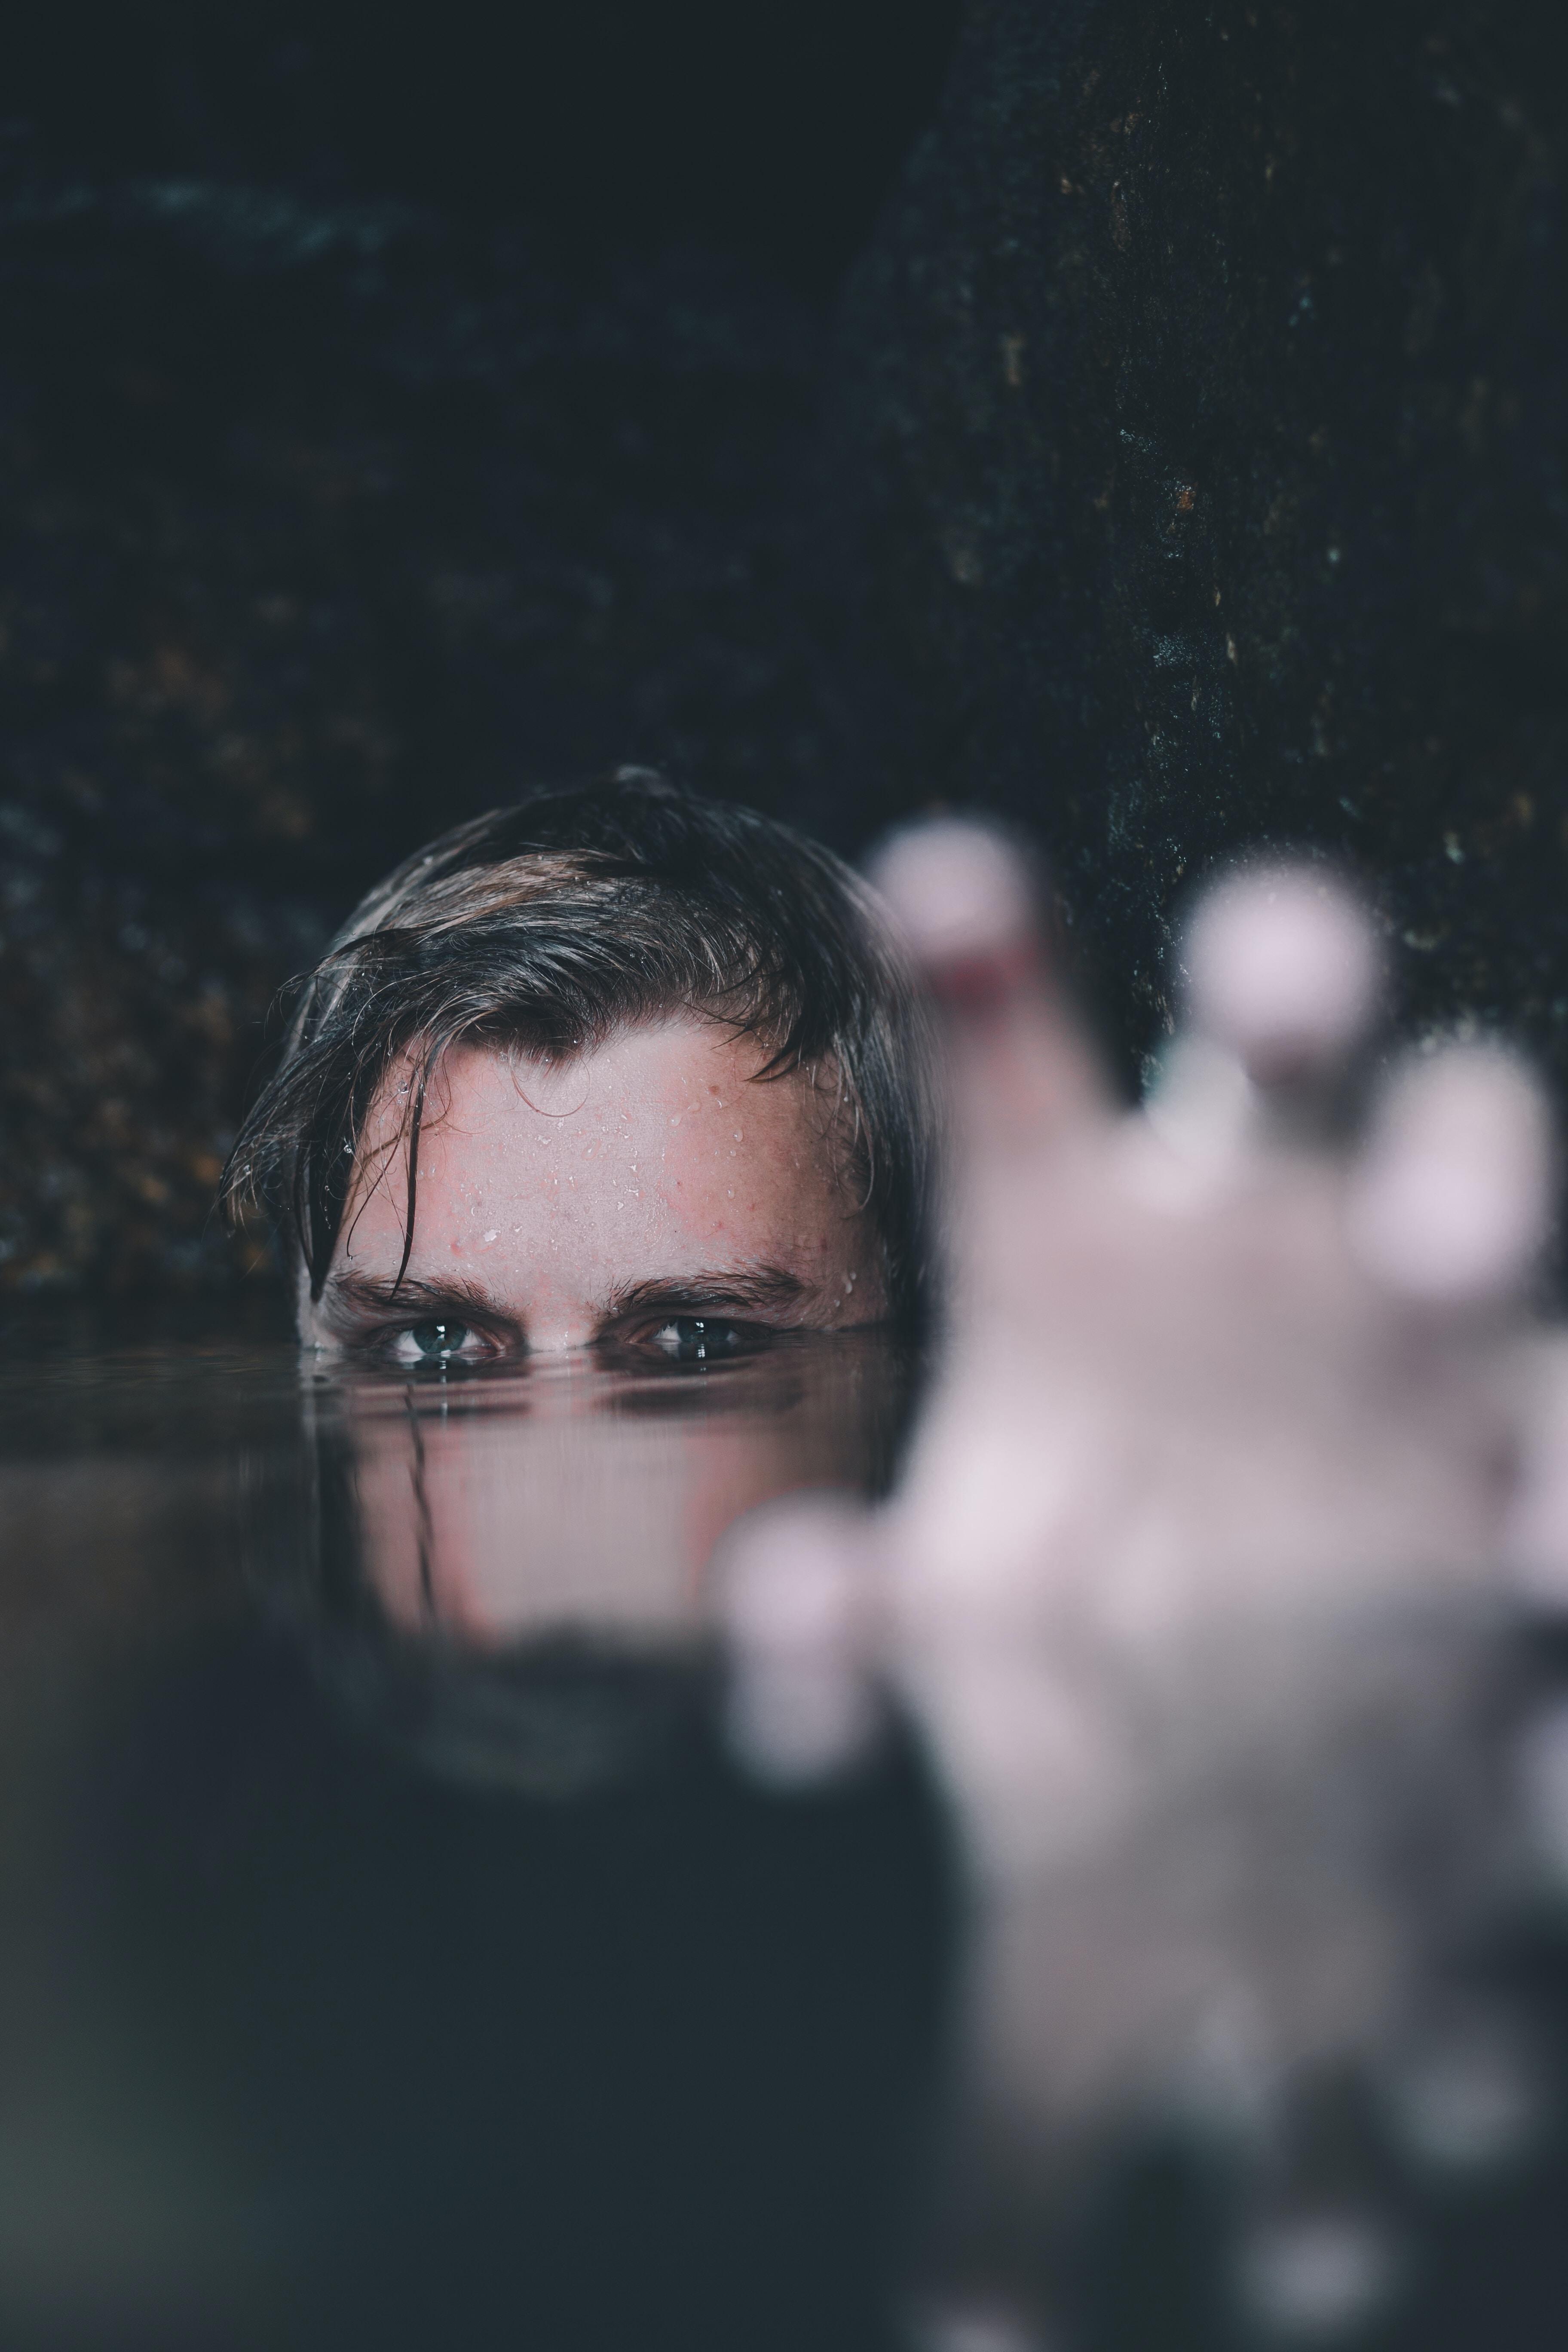 Solitude  by Dark solitude stories